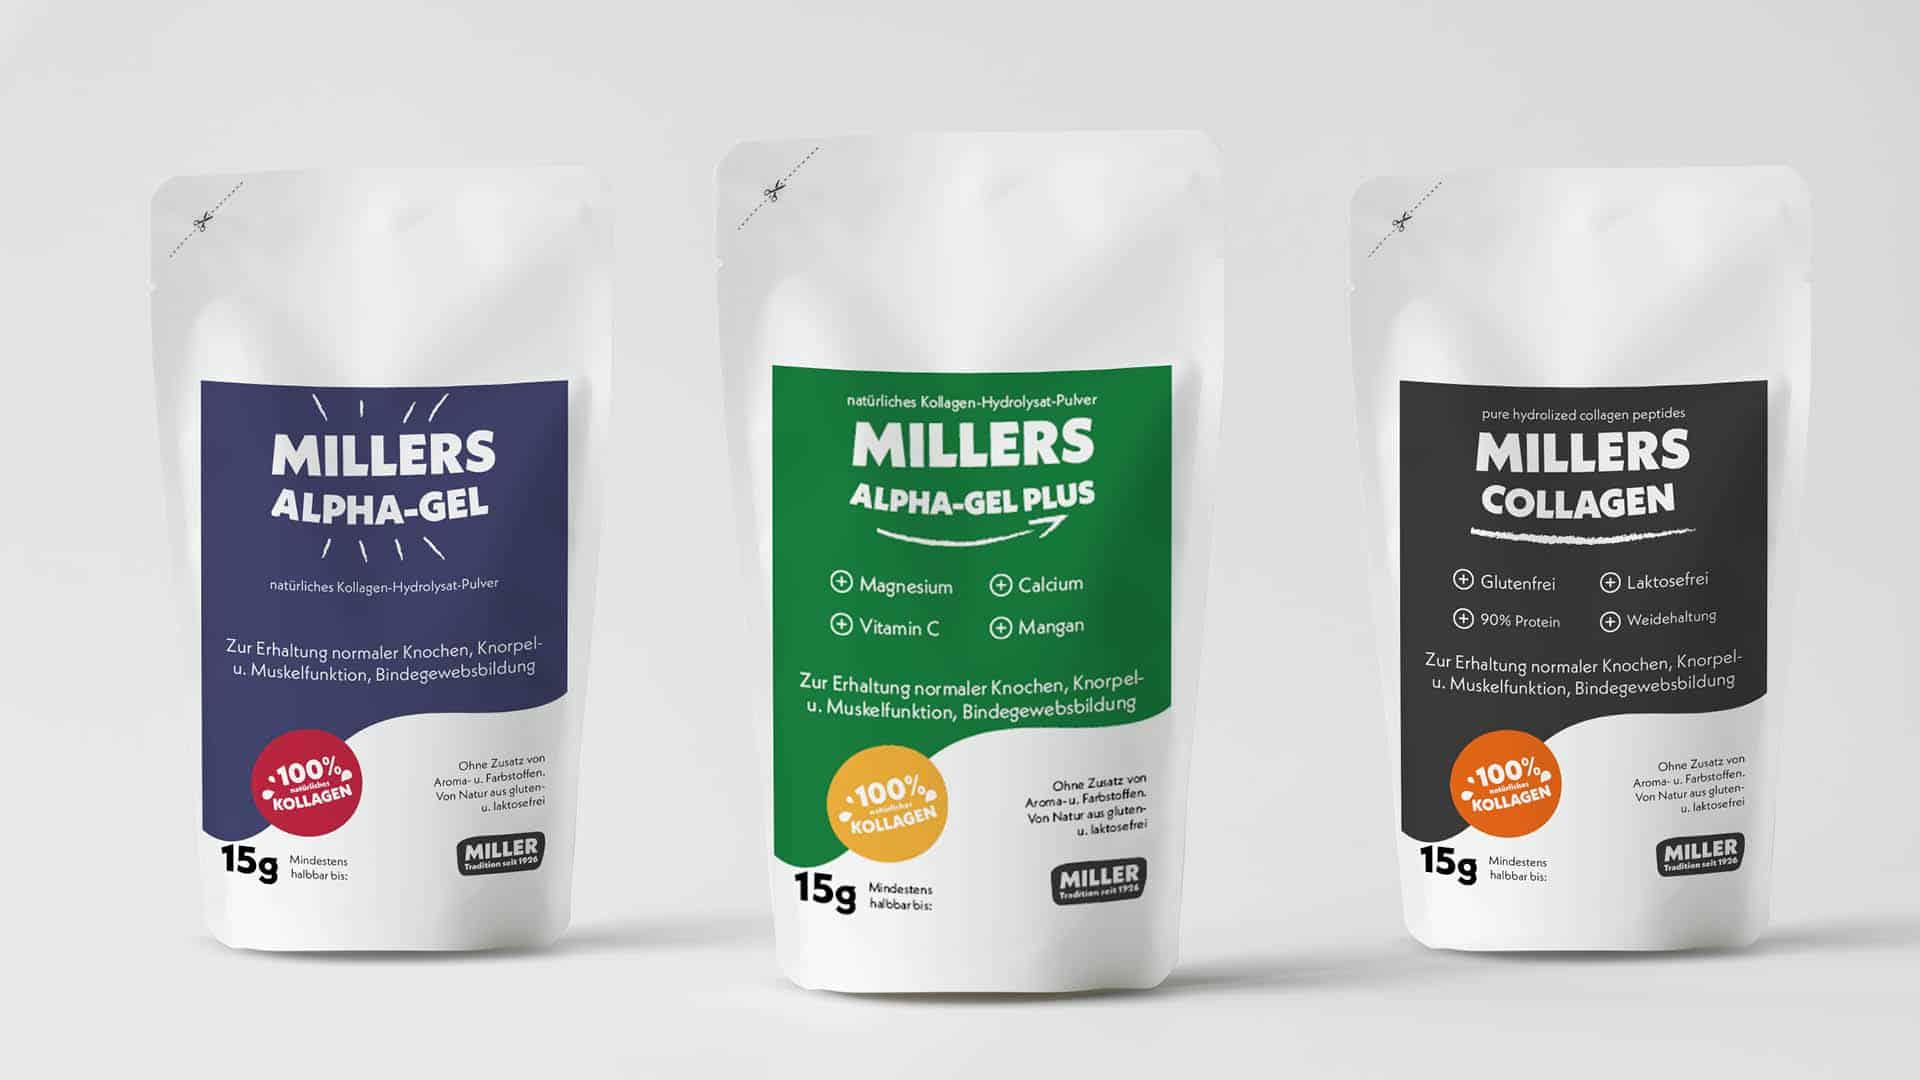 MILLERS Collagen Produktdesign | BONFIRE GmbH | Branding Familienunternehmen